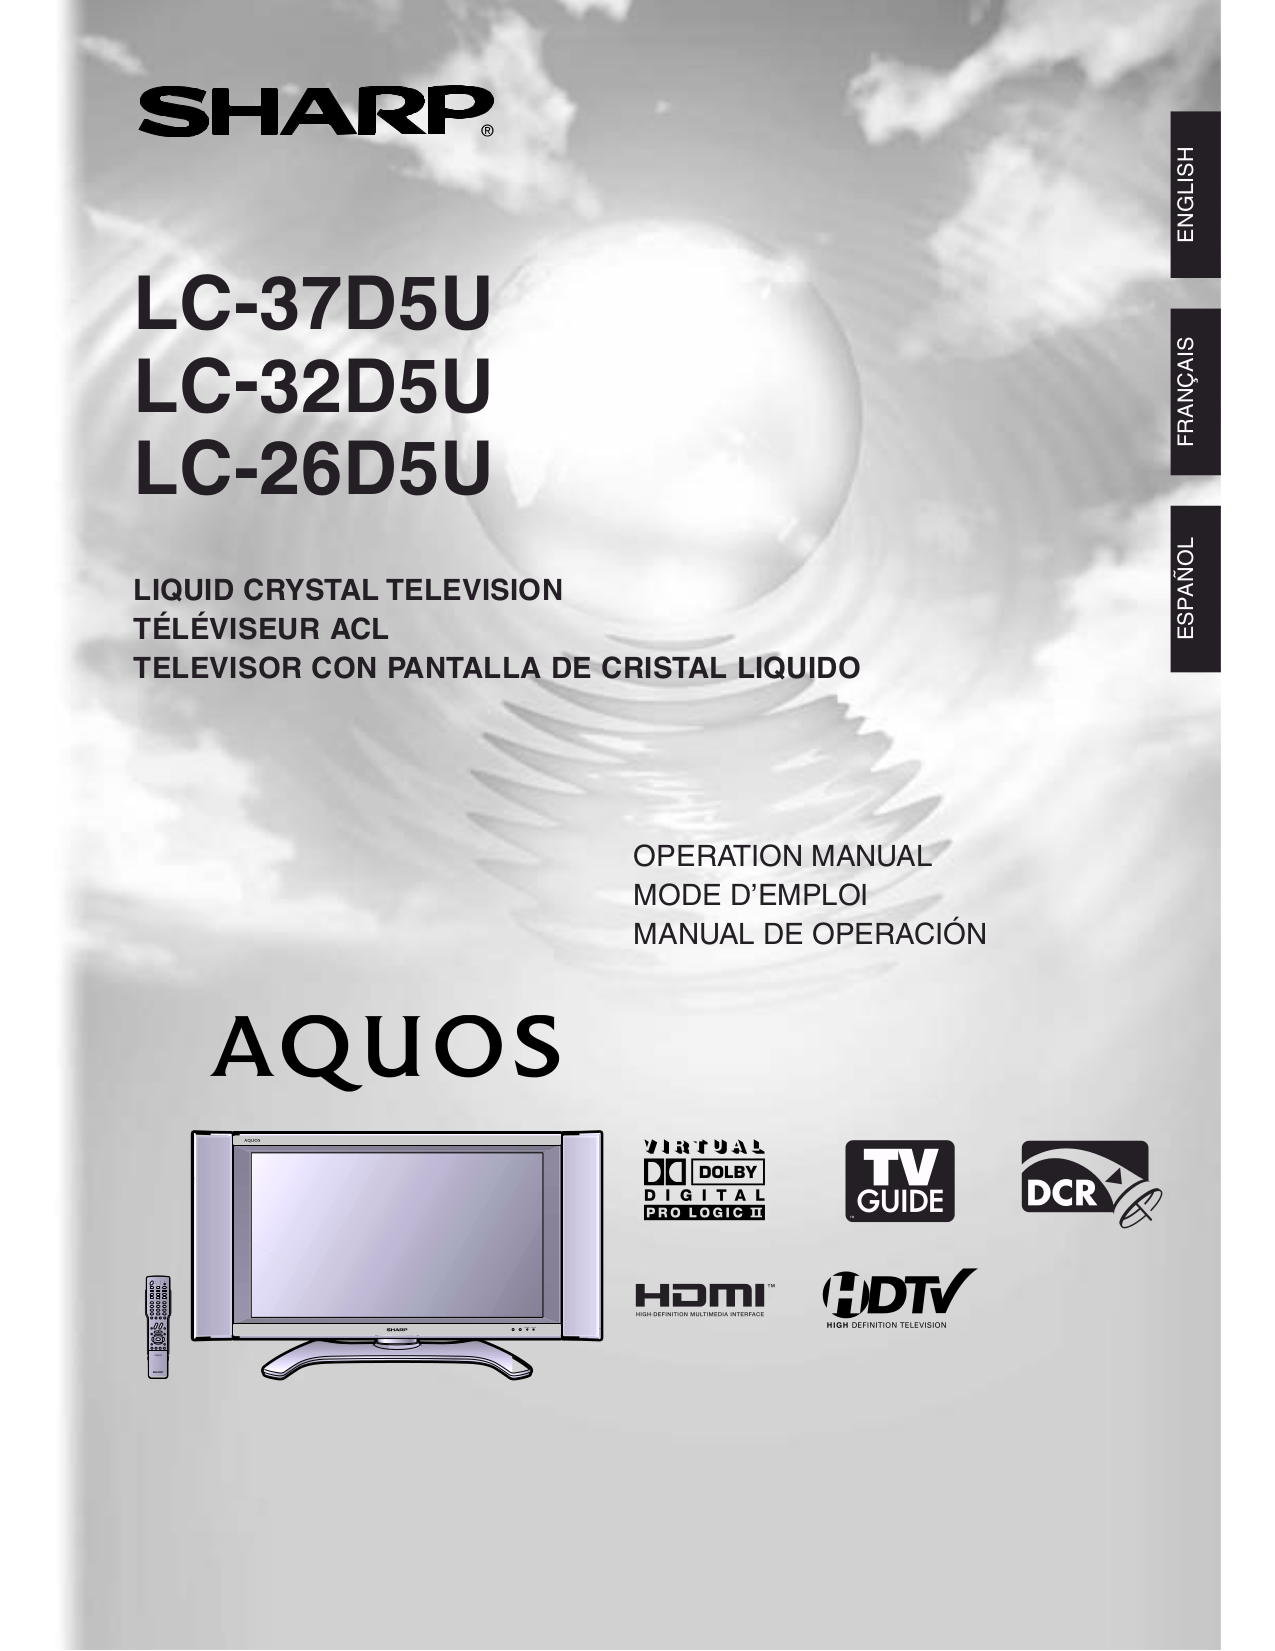 "aquos sharp tv manual rh aquos sharp tv manual mollysmenu us sharp aquos 32-inch lc-32d59u lcd tv manual Sharp AQUOS 32"" TV"